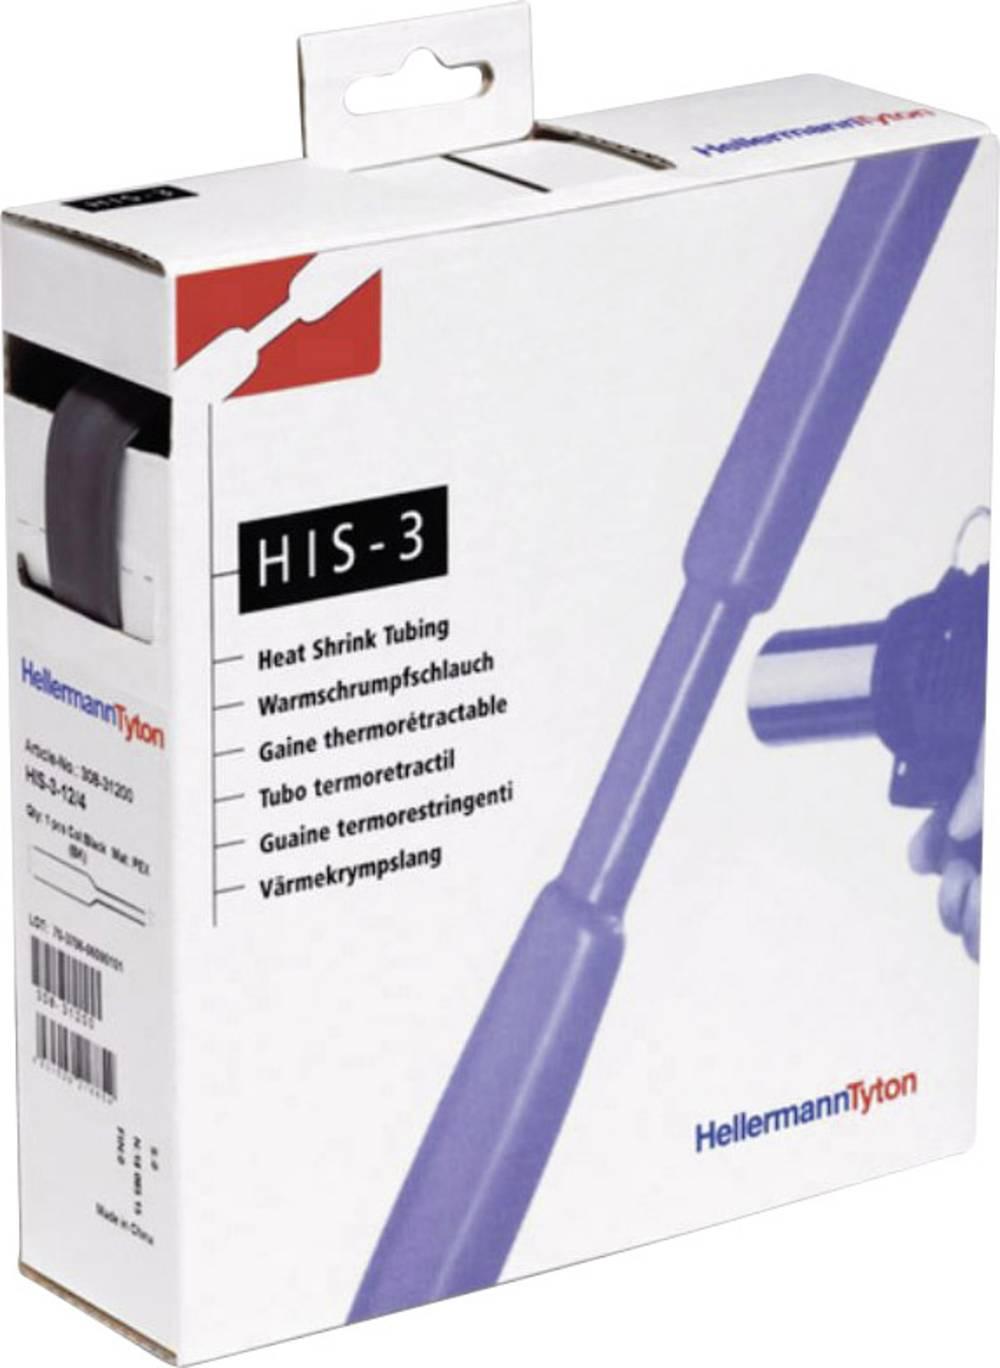 Cijevni omot HIS-1,5/0,5-PEX-CL 10M HellermannTyton 308-30153